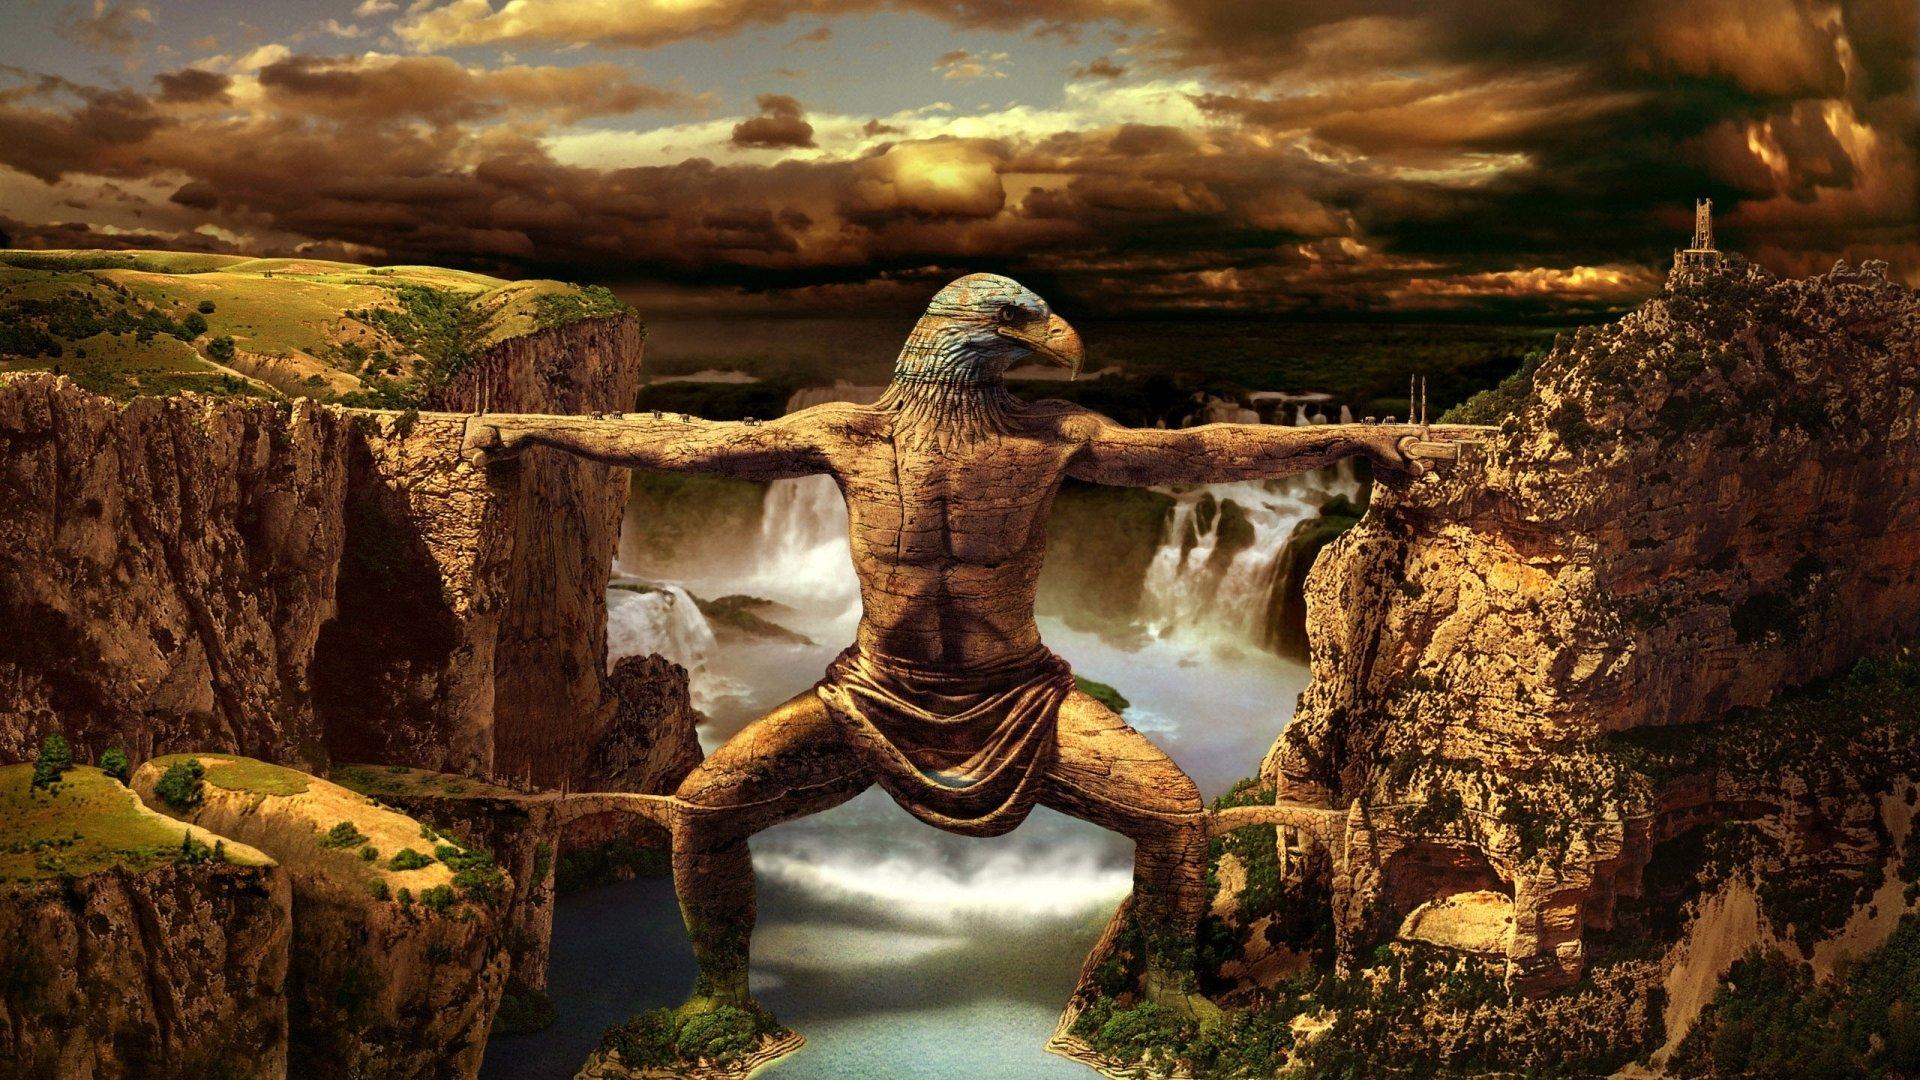 Fantasy Landscape Wallpapers 1920x1080 Full Hd 1080p Desktop